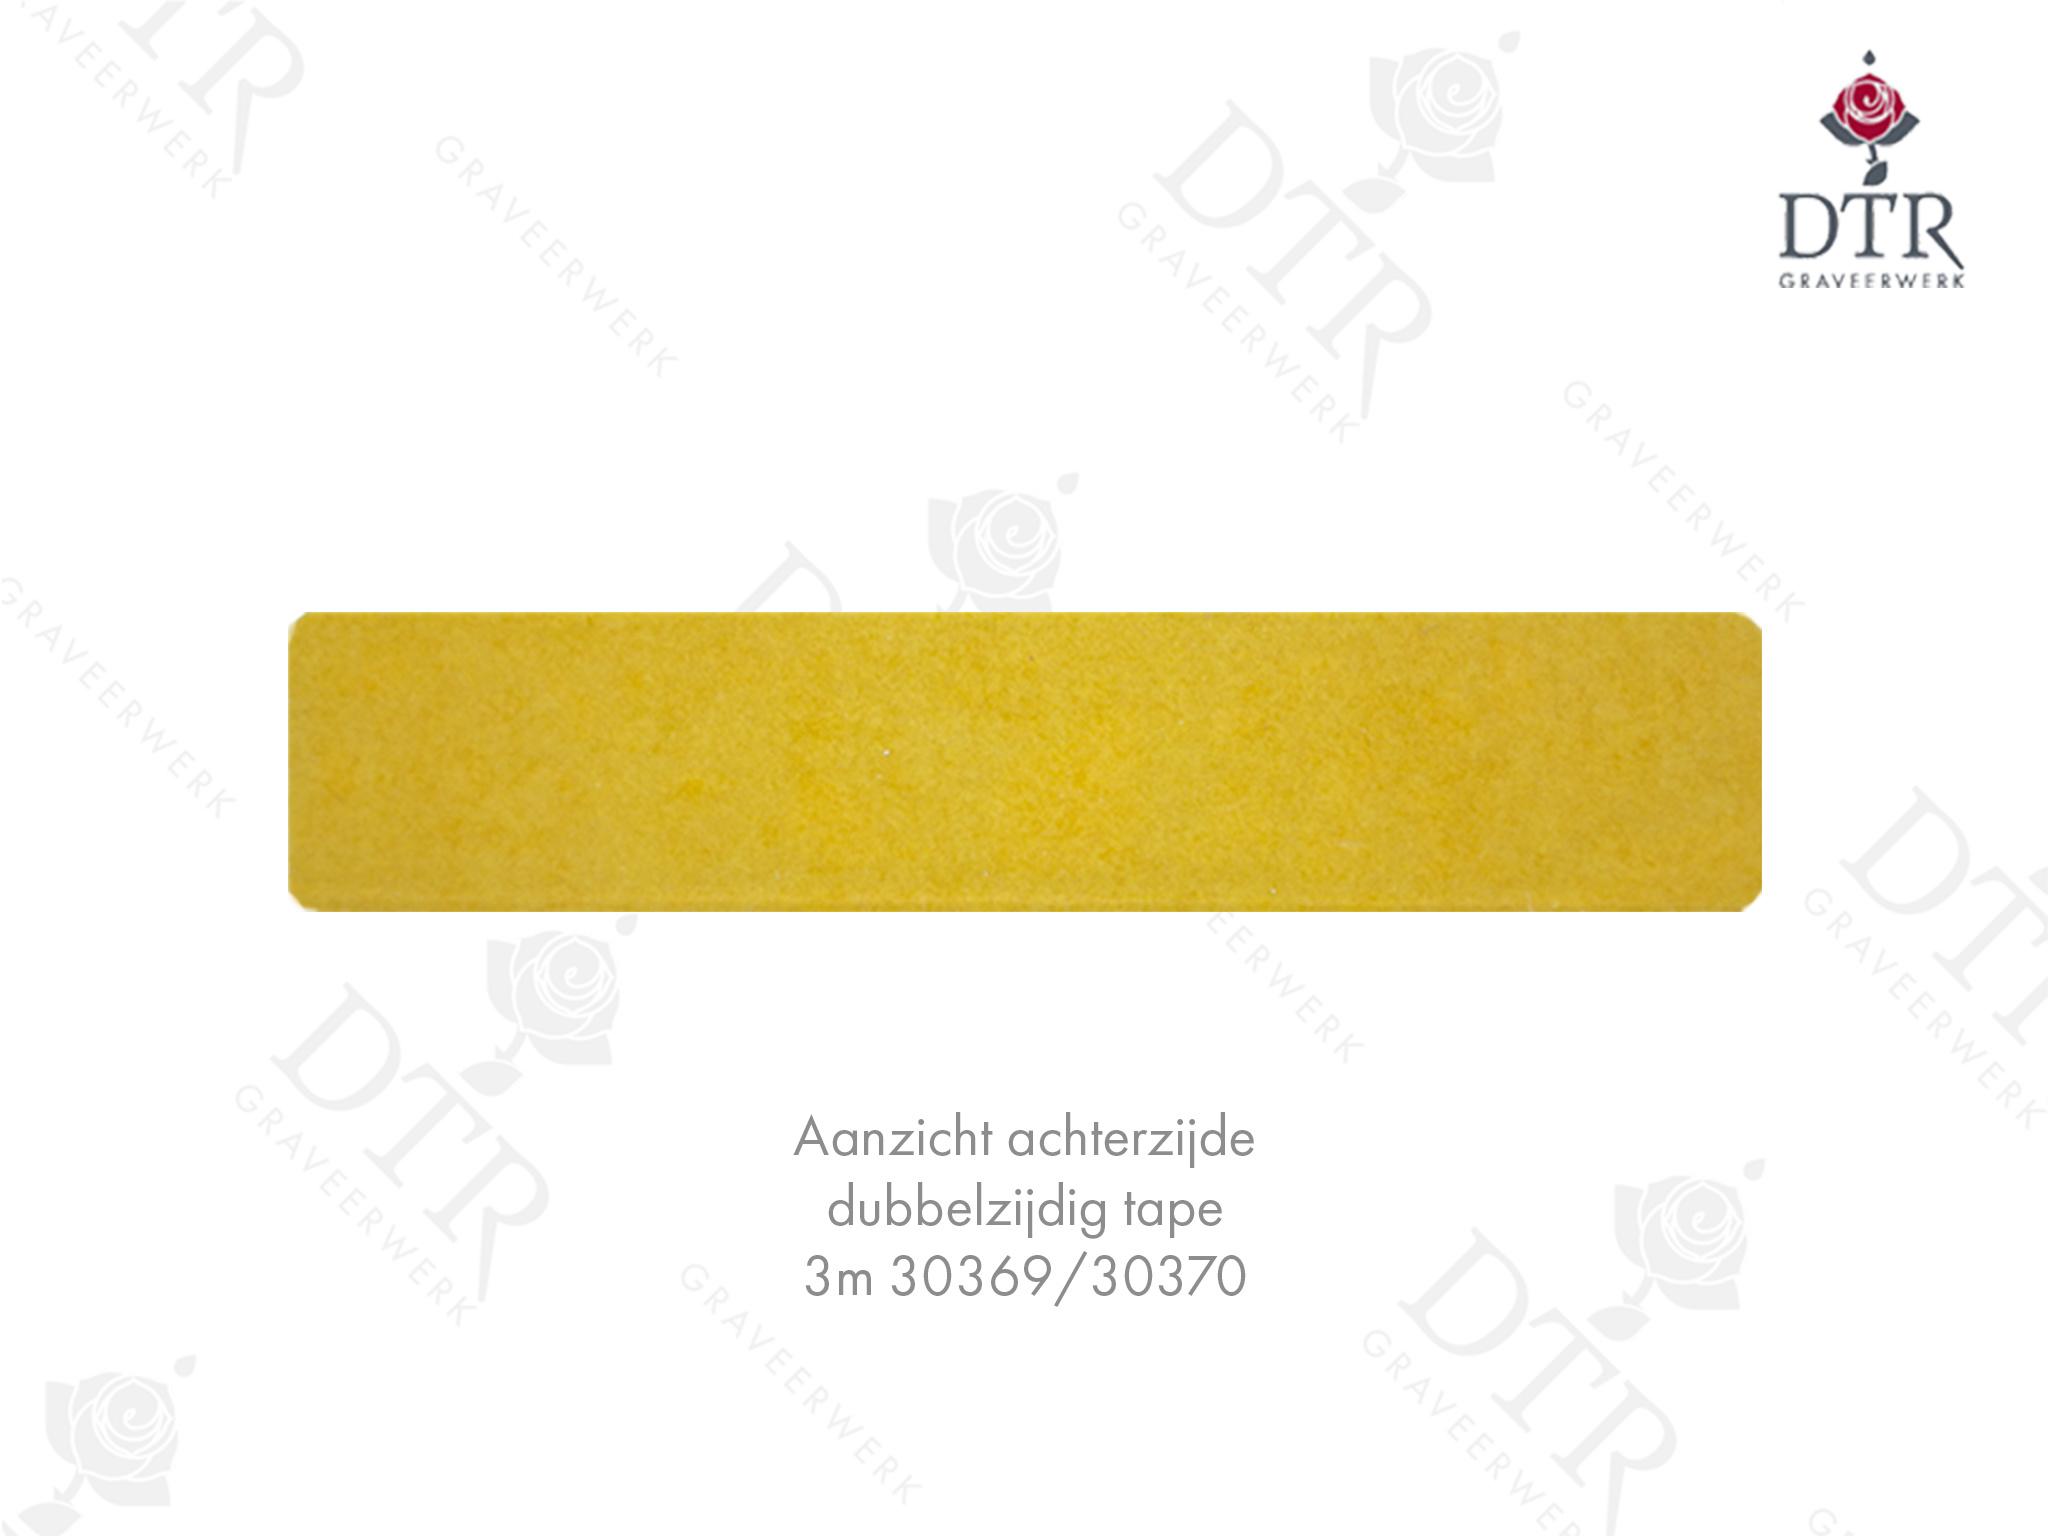 Oremusplein / Bakkerstraat-Nummerplaatjes